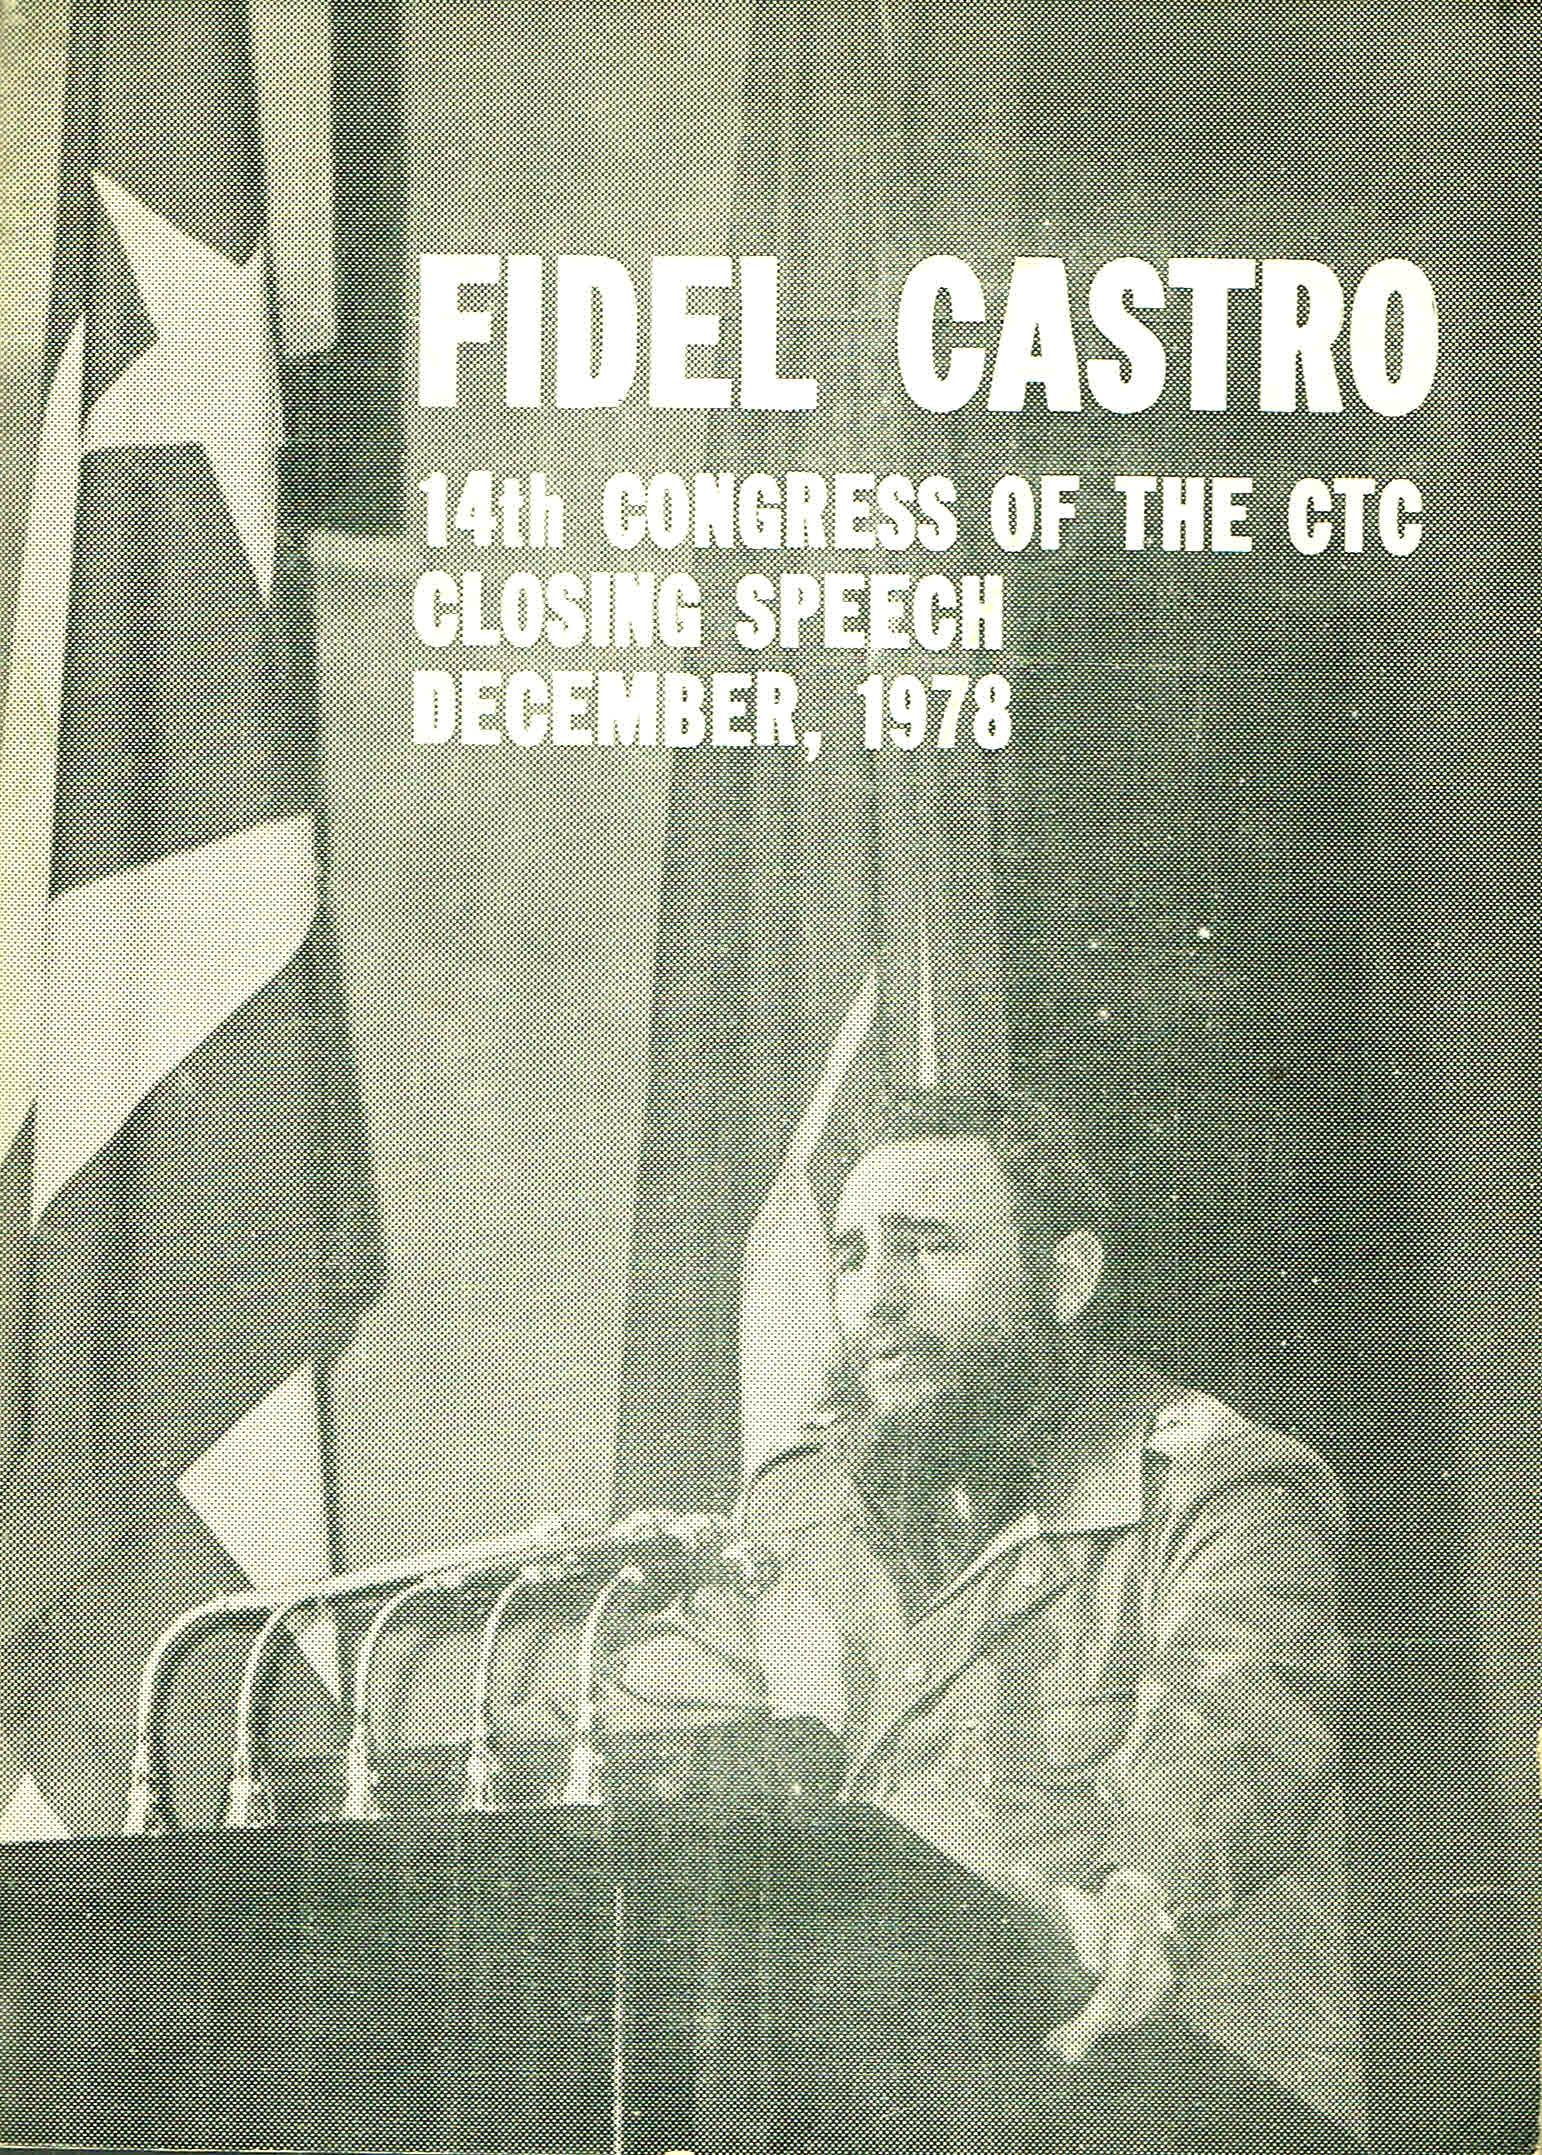 fidel castro 14 congress of the ctc closing speech december 1978